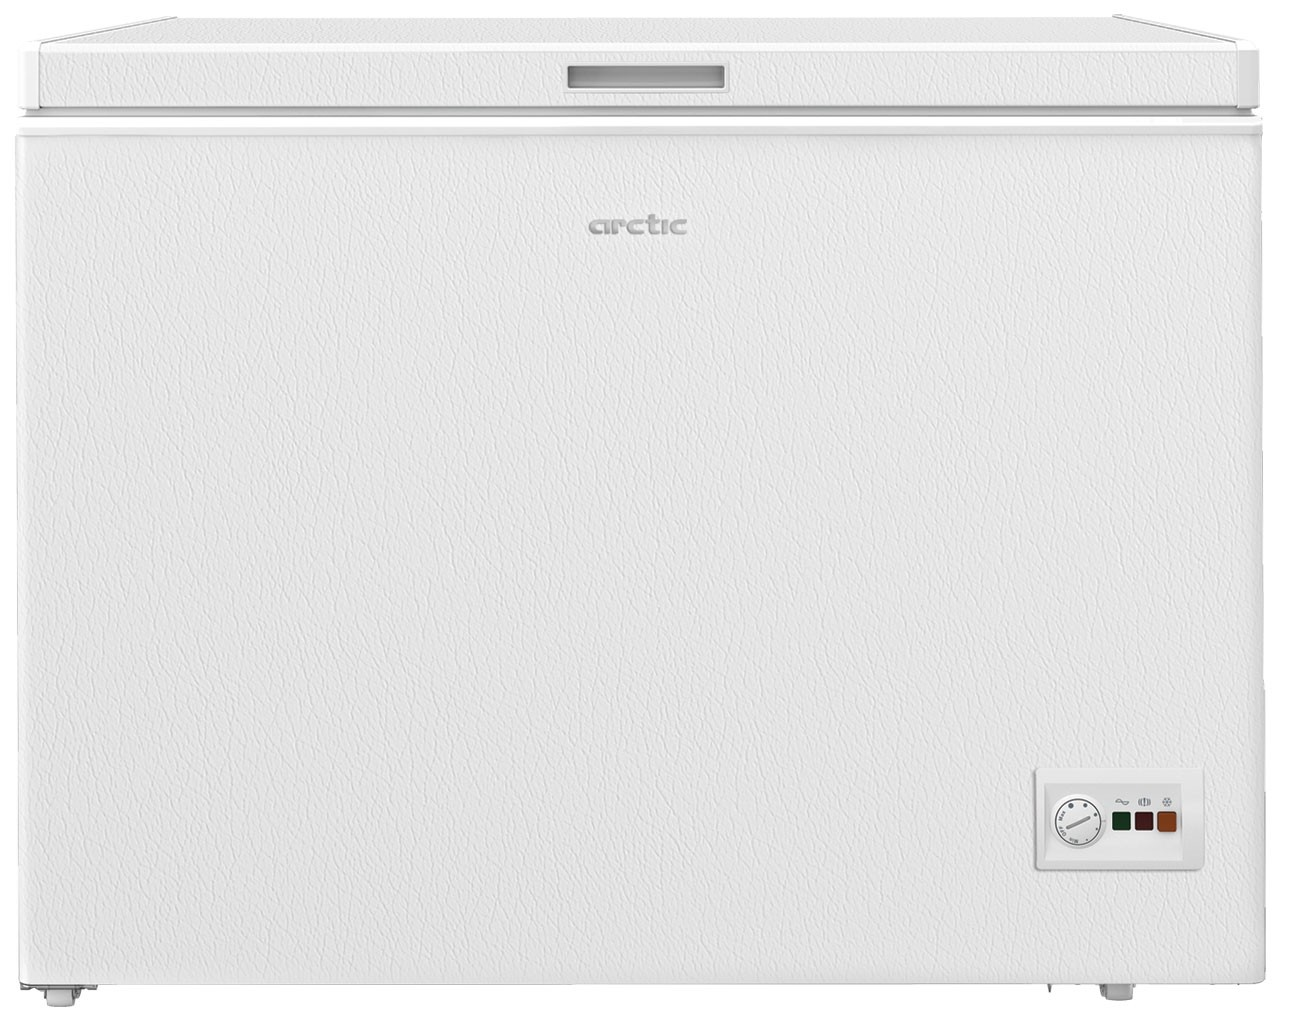 Lada frigorifica Arctic AO40P30